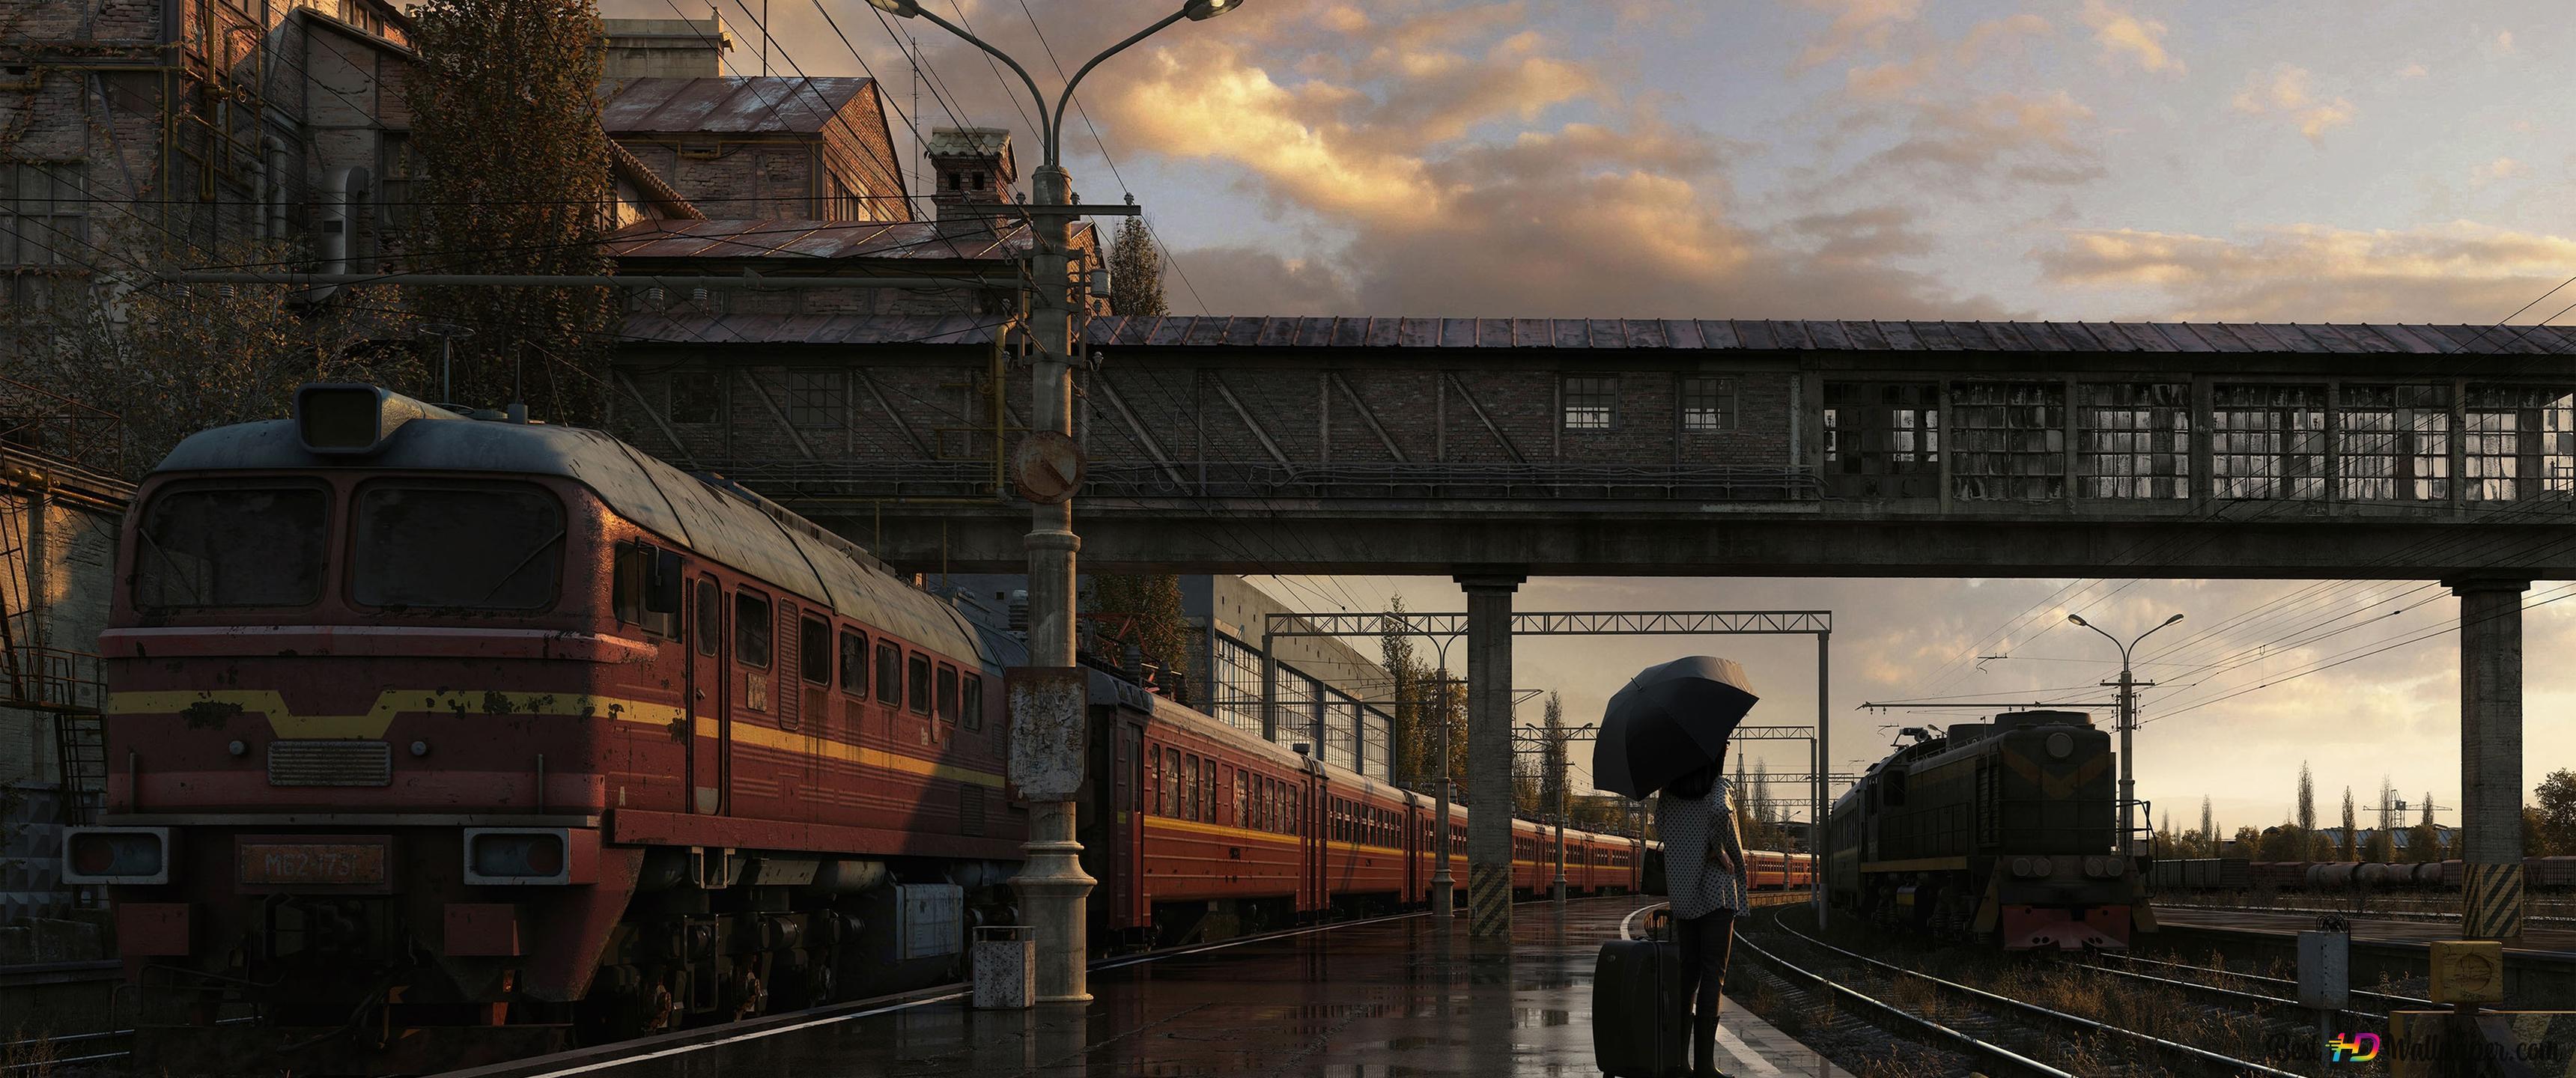 Train Station Hd Wallpaper Download